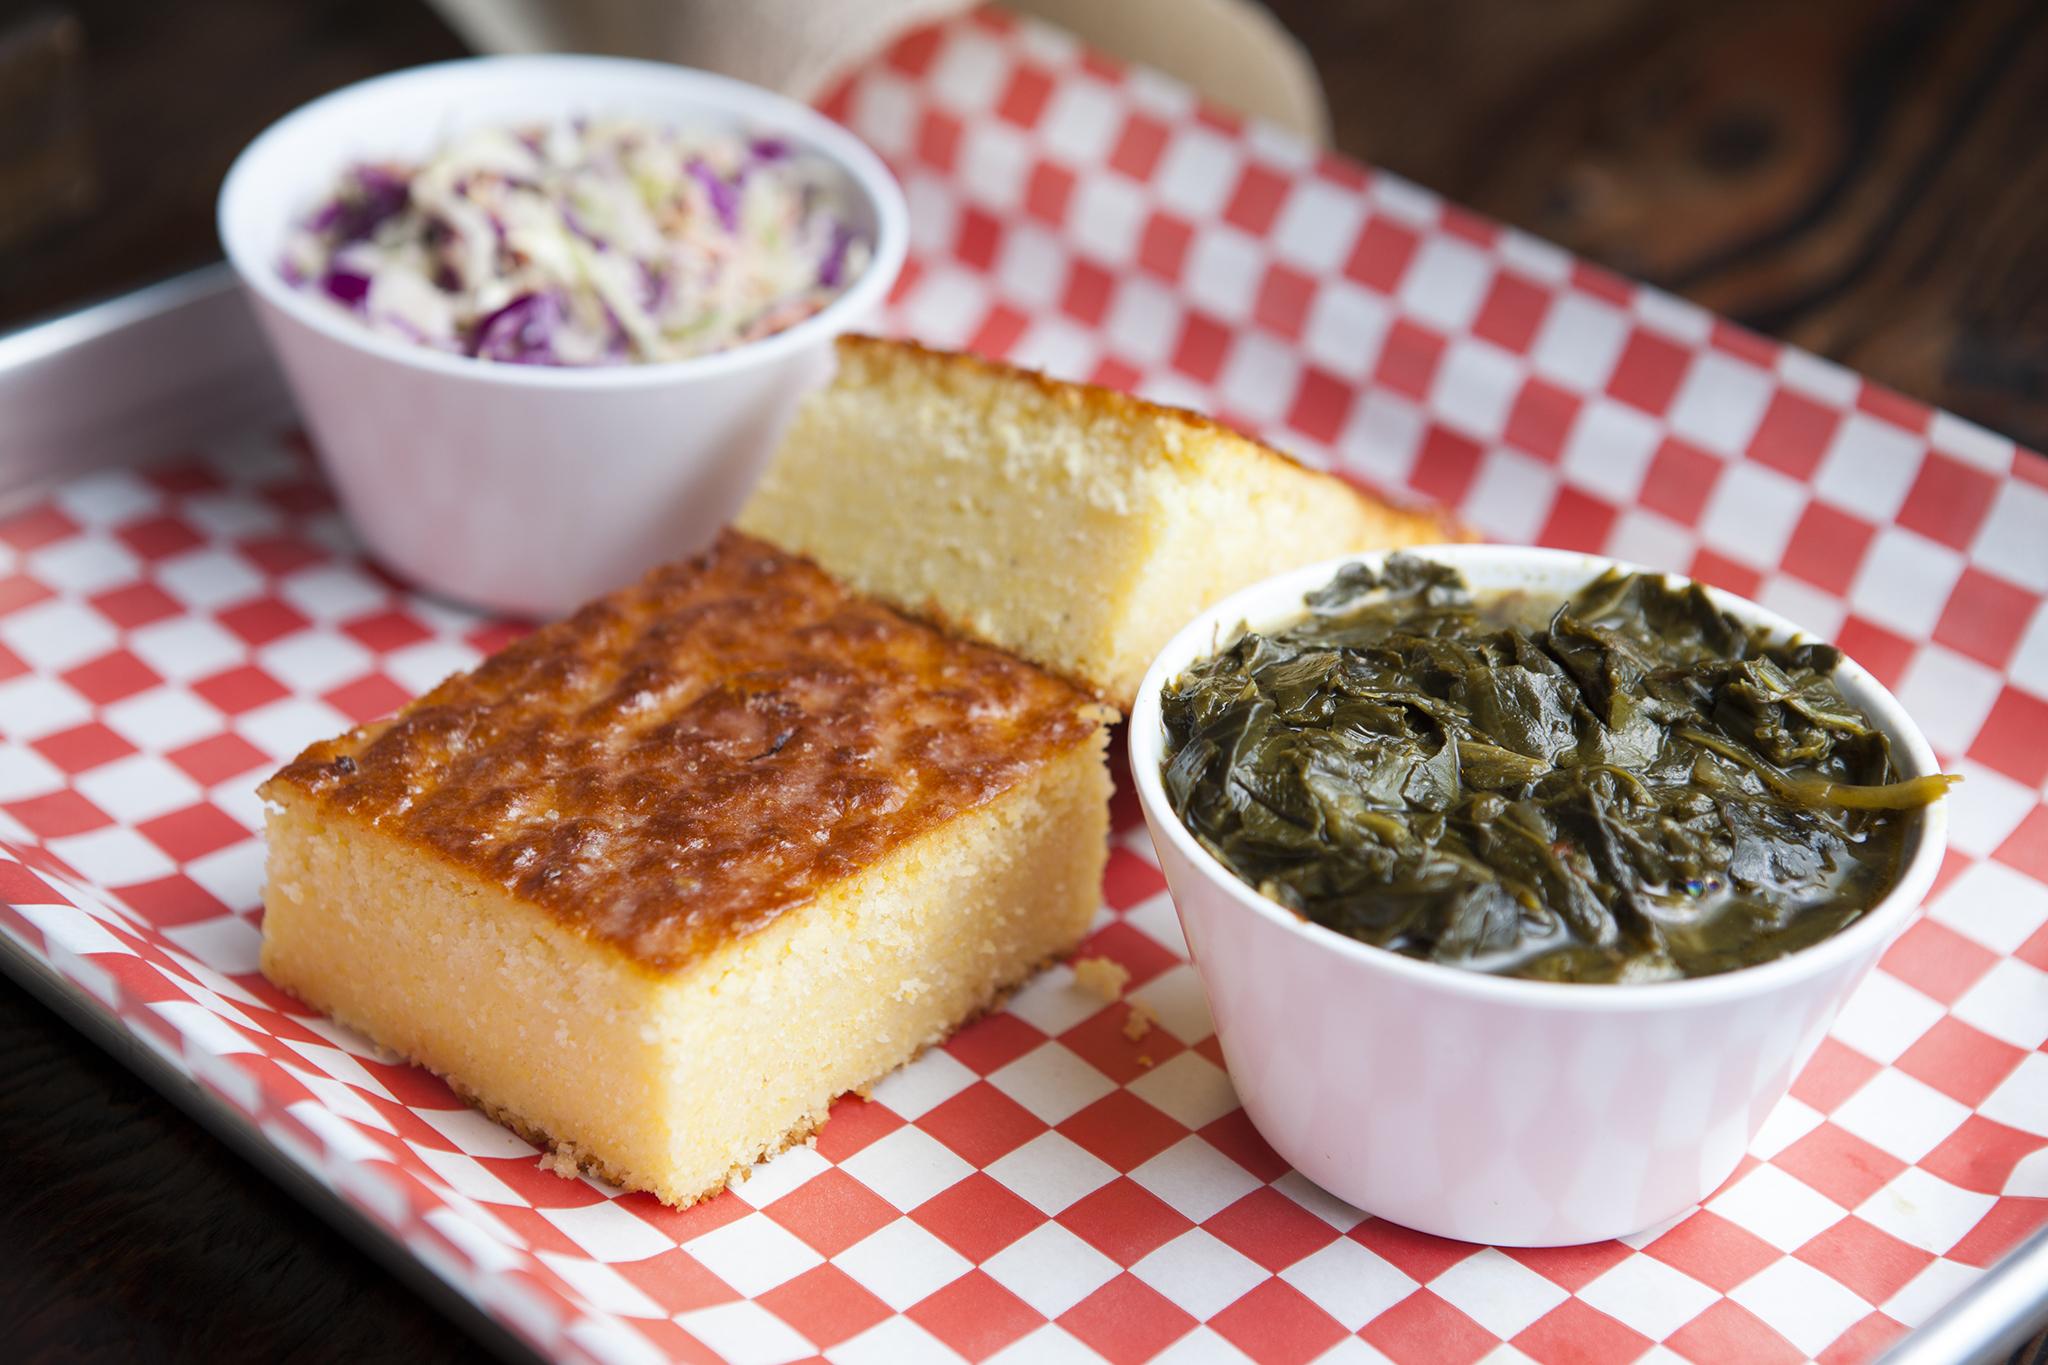 Corn bread, collard greens and cole slaw at Bludso's BBQ